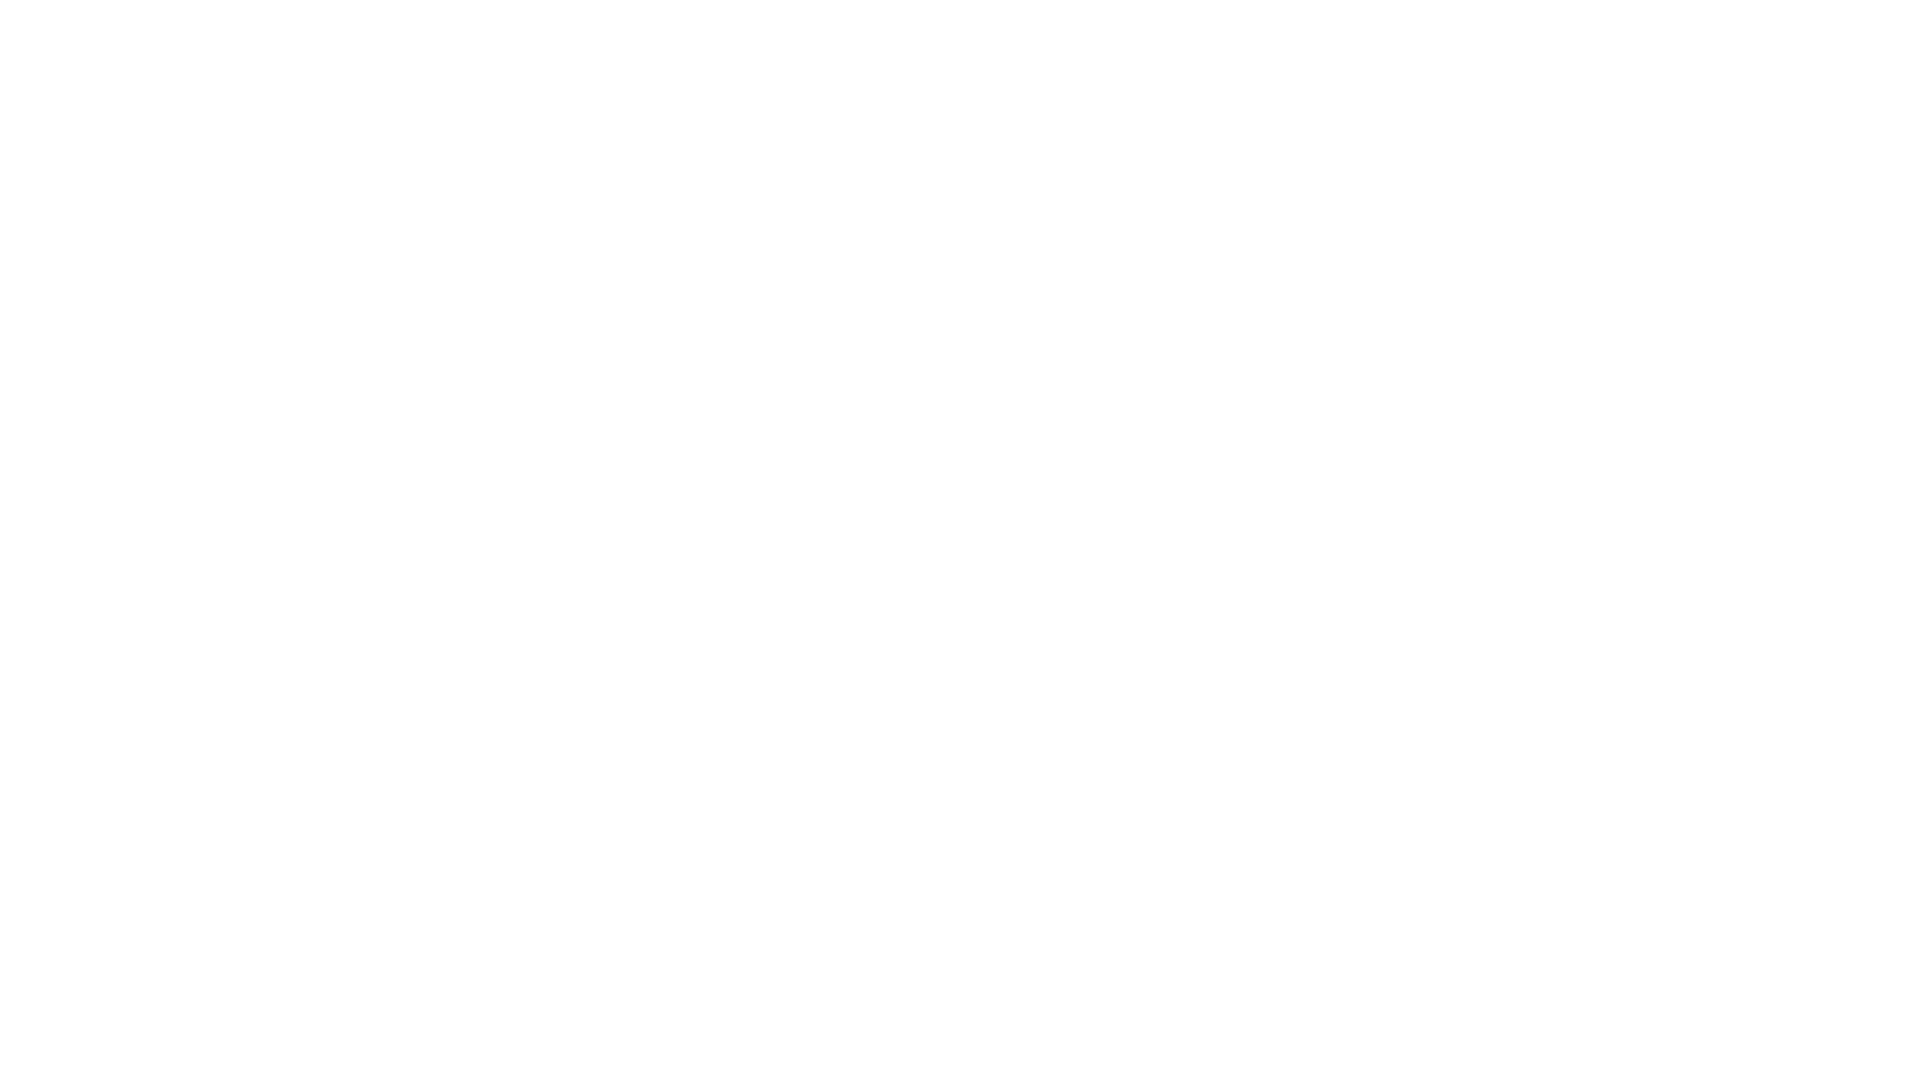 University-of-Northern-British-Columbia-logo